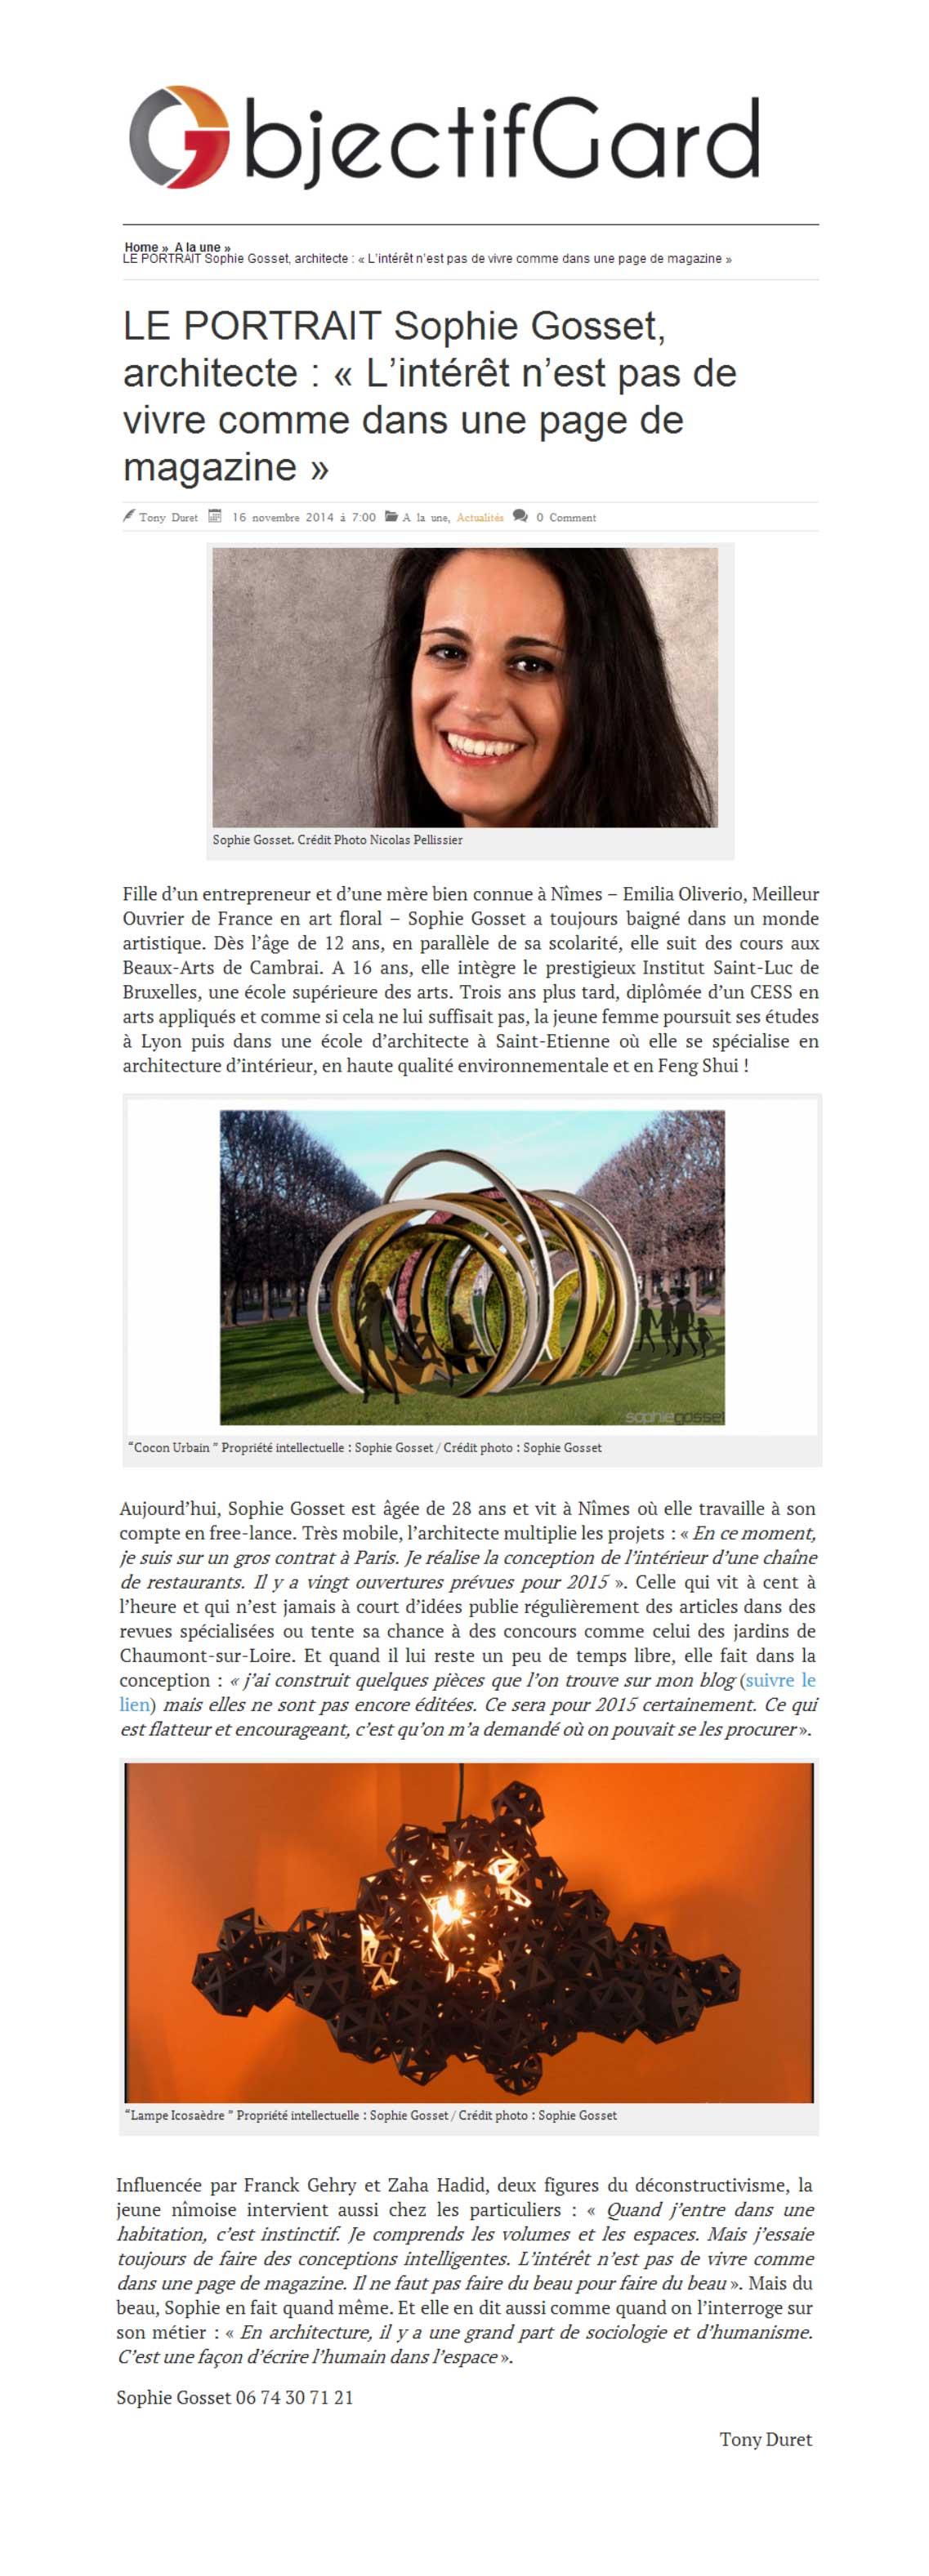 Article-Objectif-Gard-architecture-design-Sophie-Gosset